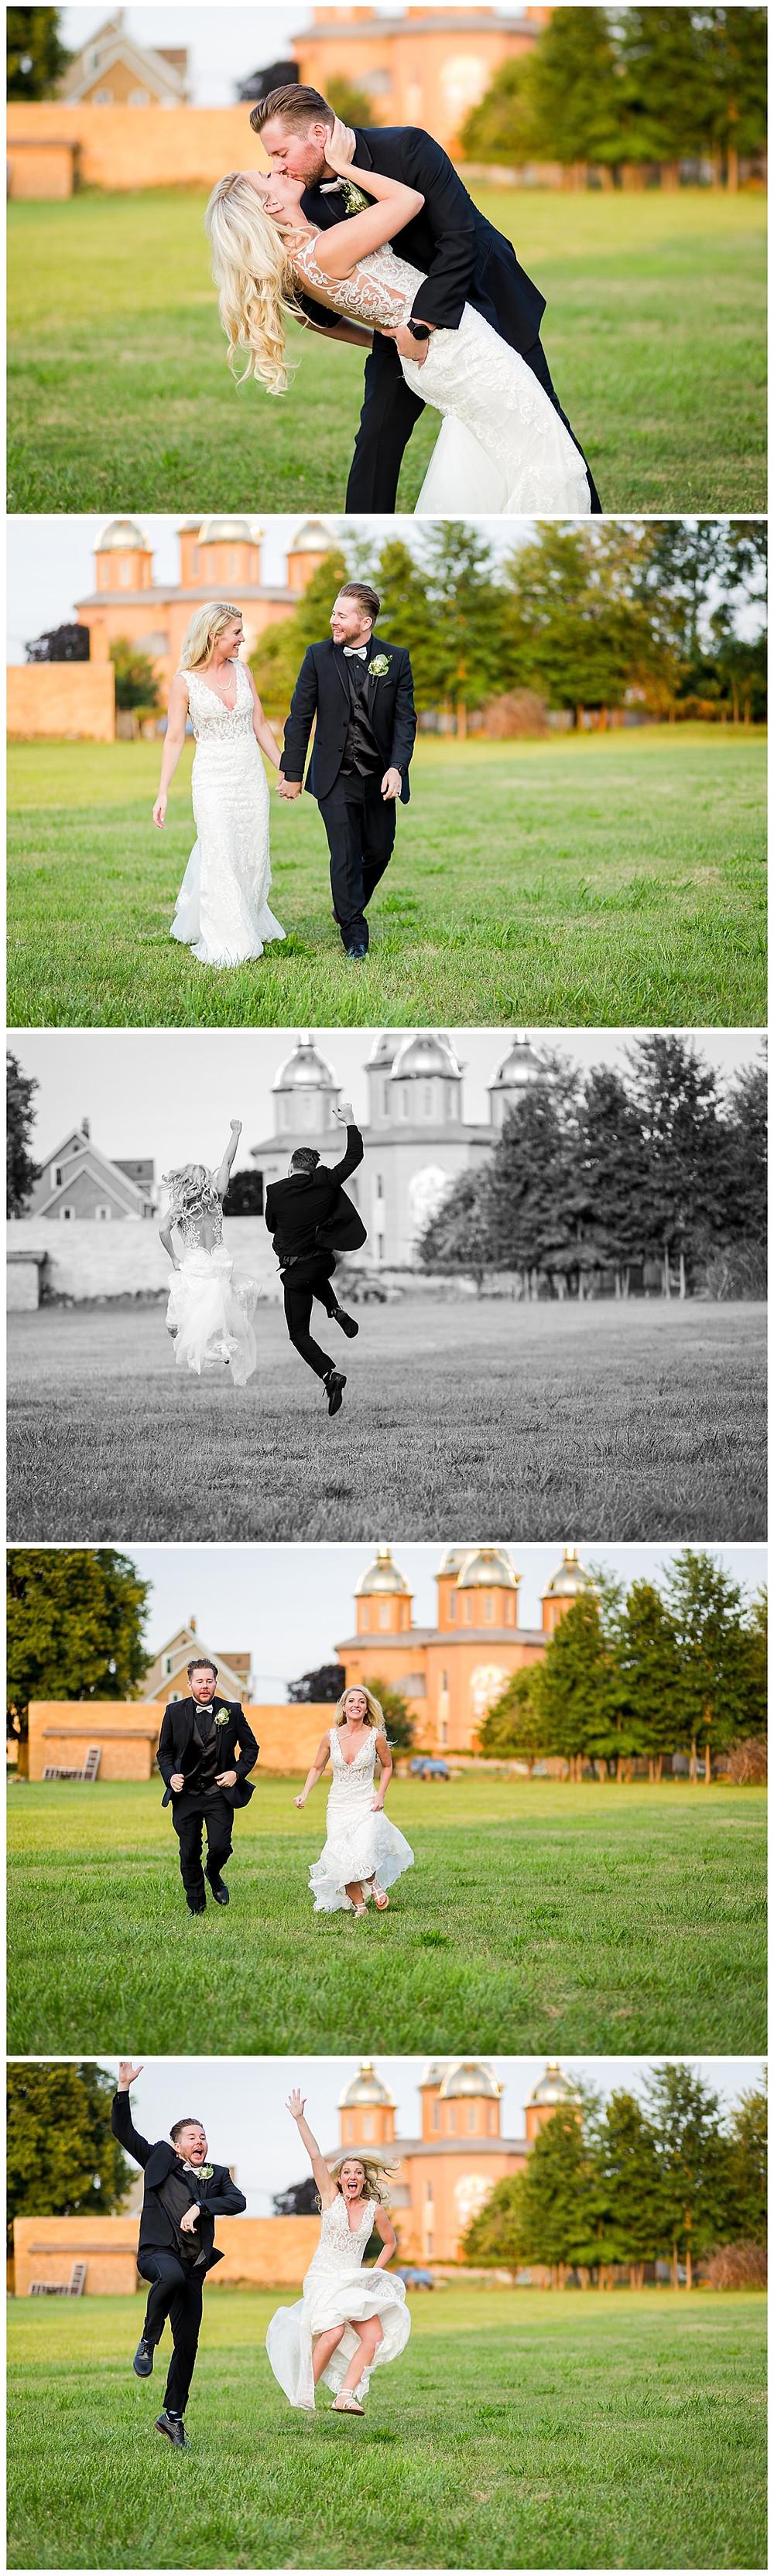 golden hour wedding photos bride and groom